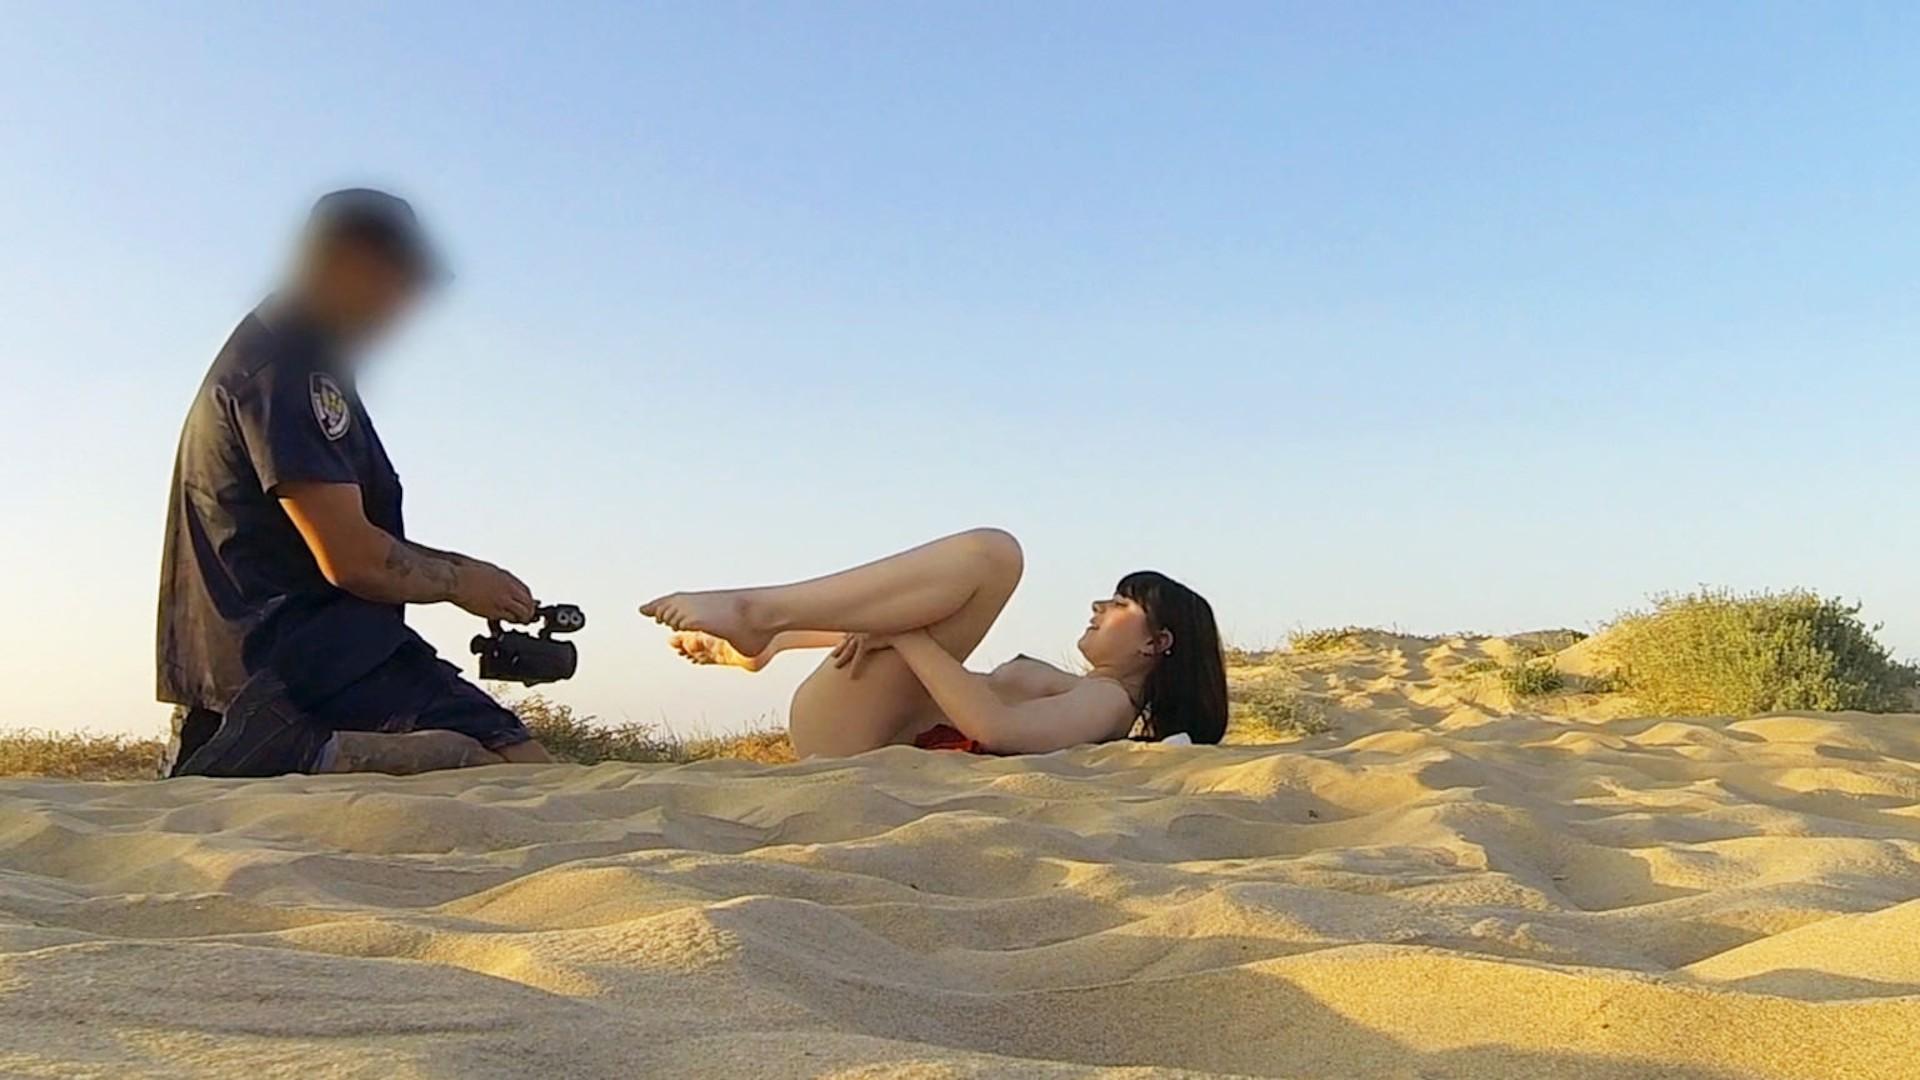 Cop Fucks Cute Teen on Nudist Beach - Fake Cop